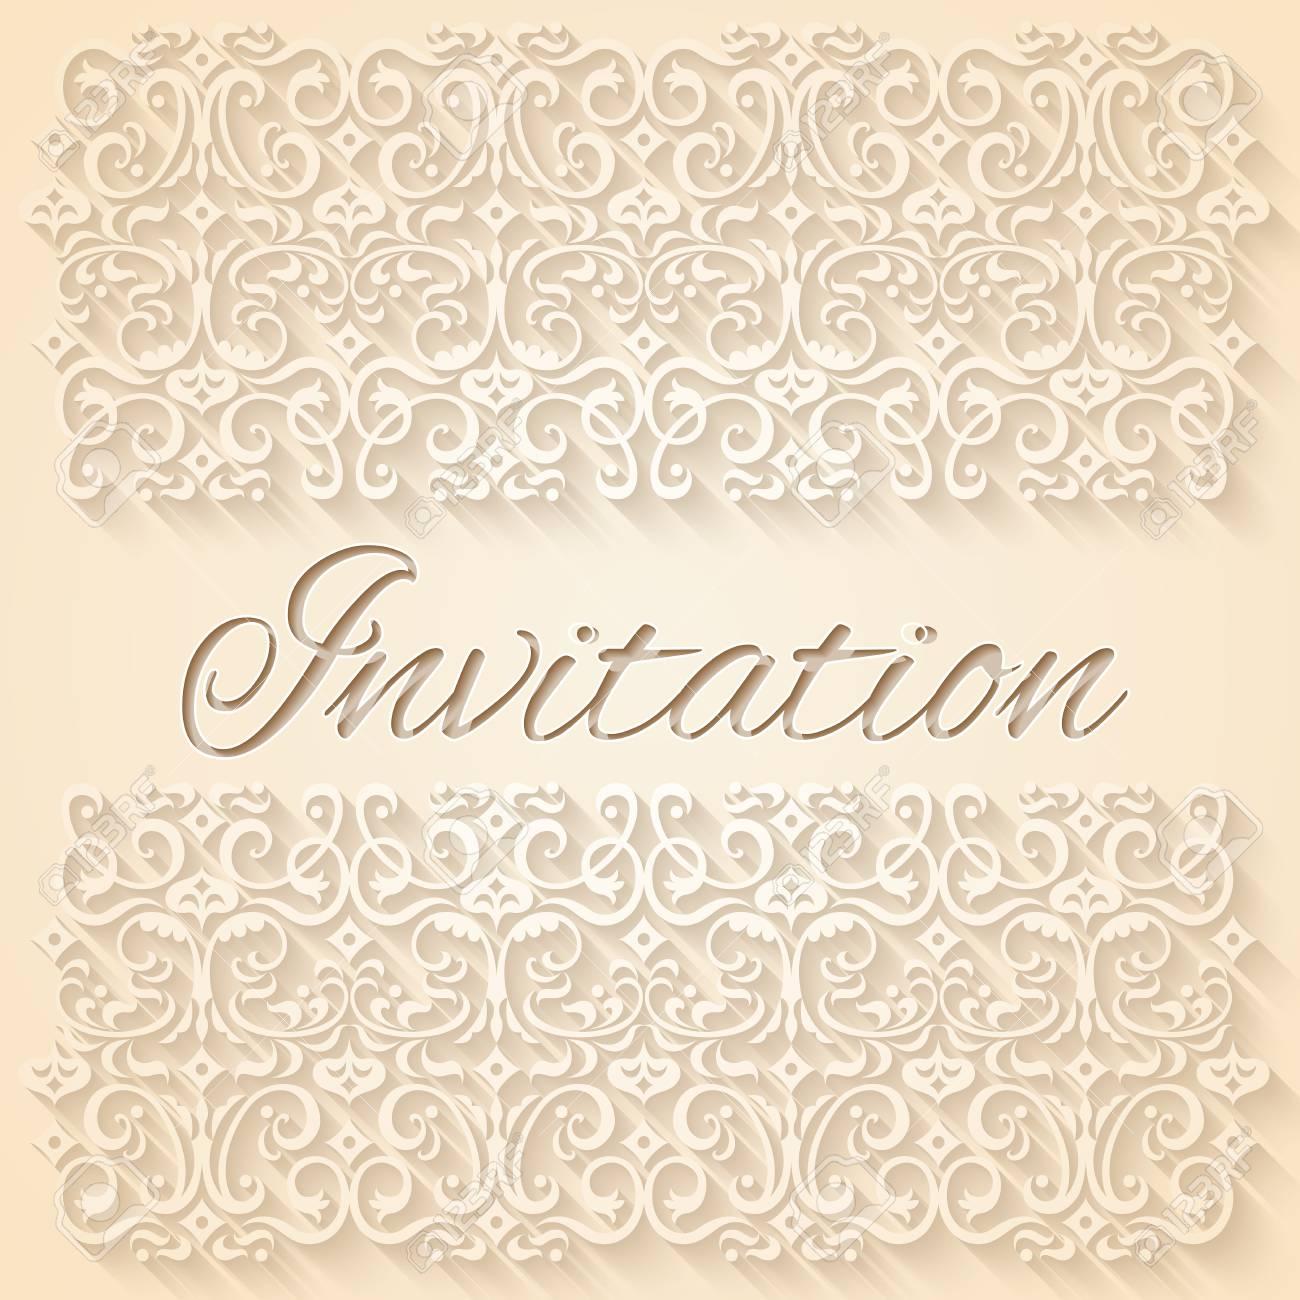 Beige floral ornament wedding invitation card rgb eps 10 vector illustration stock vector 47485645